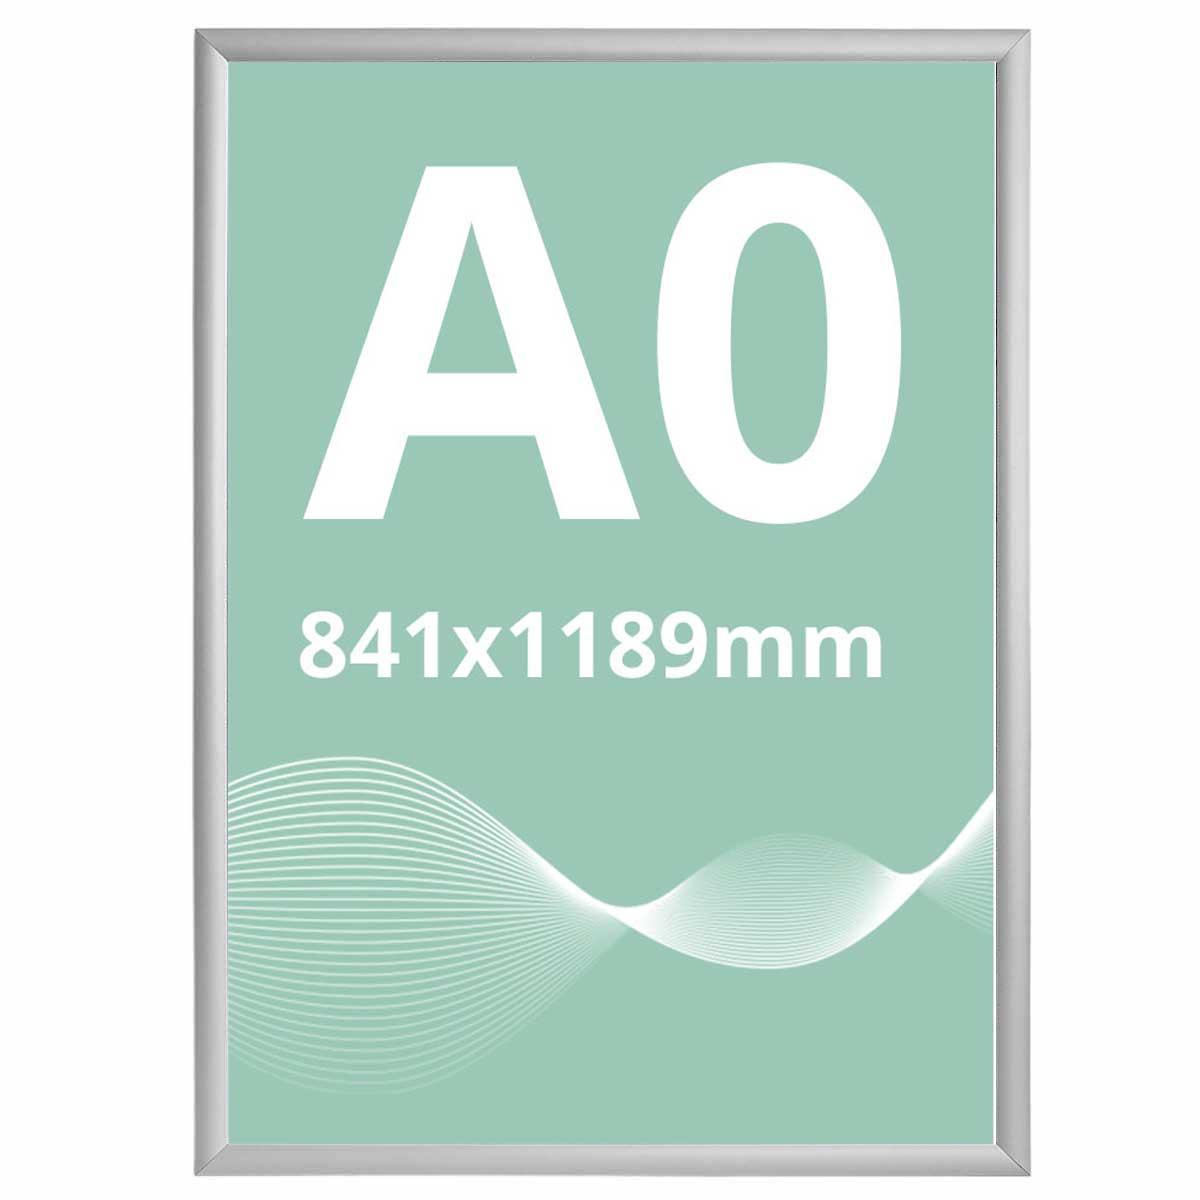 Ramă click 25, Poster Frame din aluminiu, cu colțuri drepte A0, JJ DISPLAYS, 841 x 1189 mm